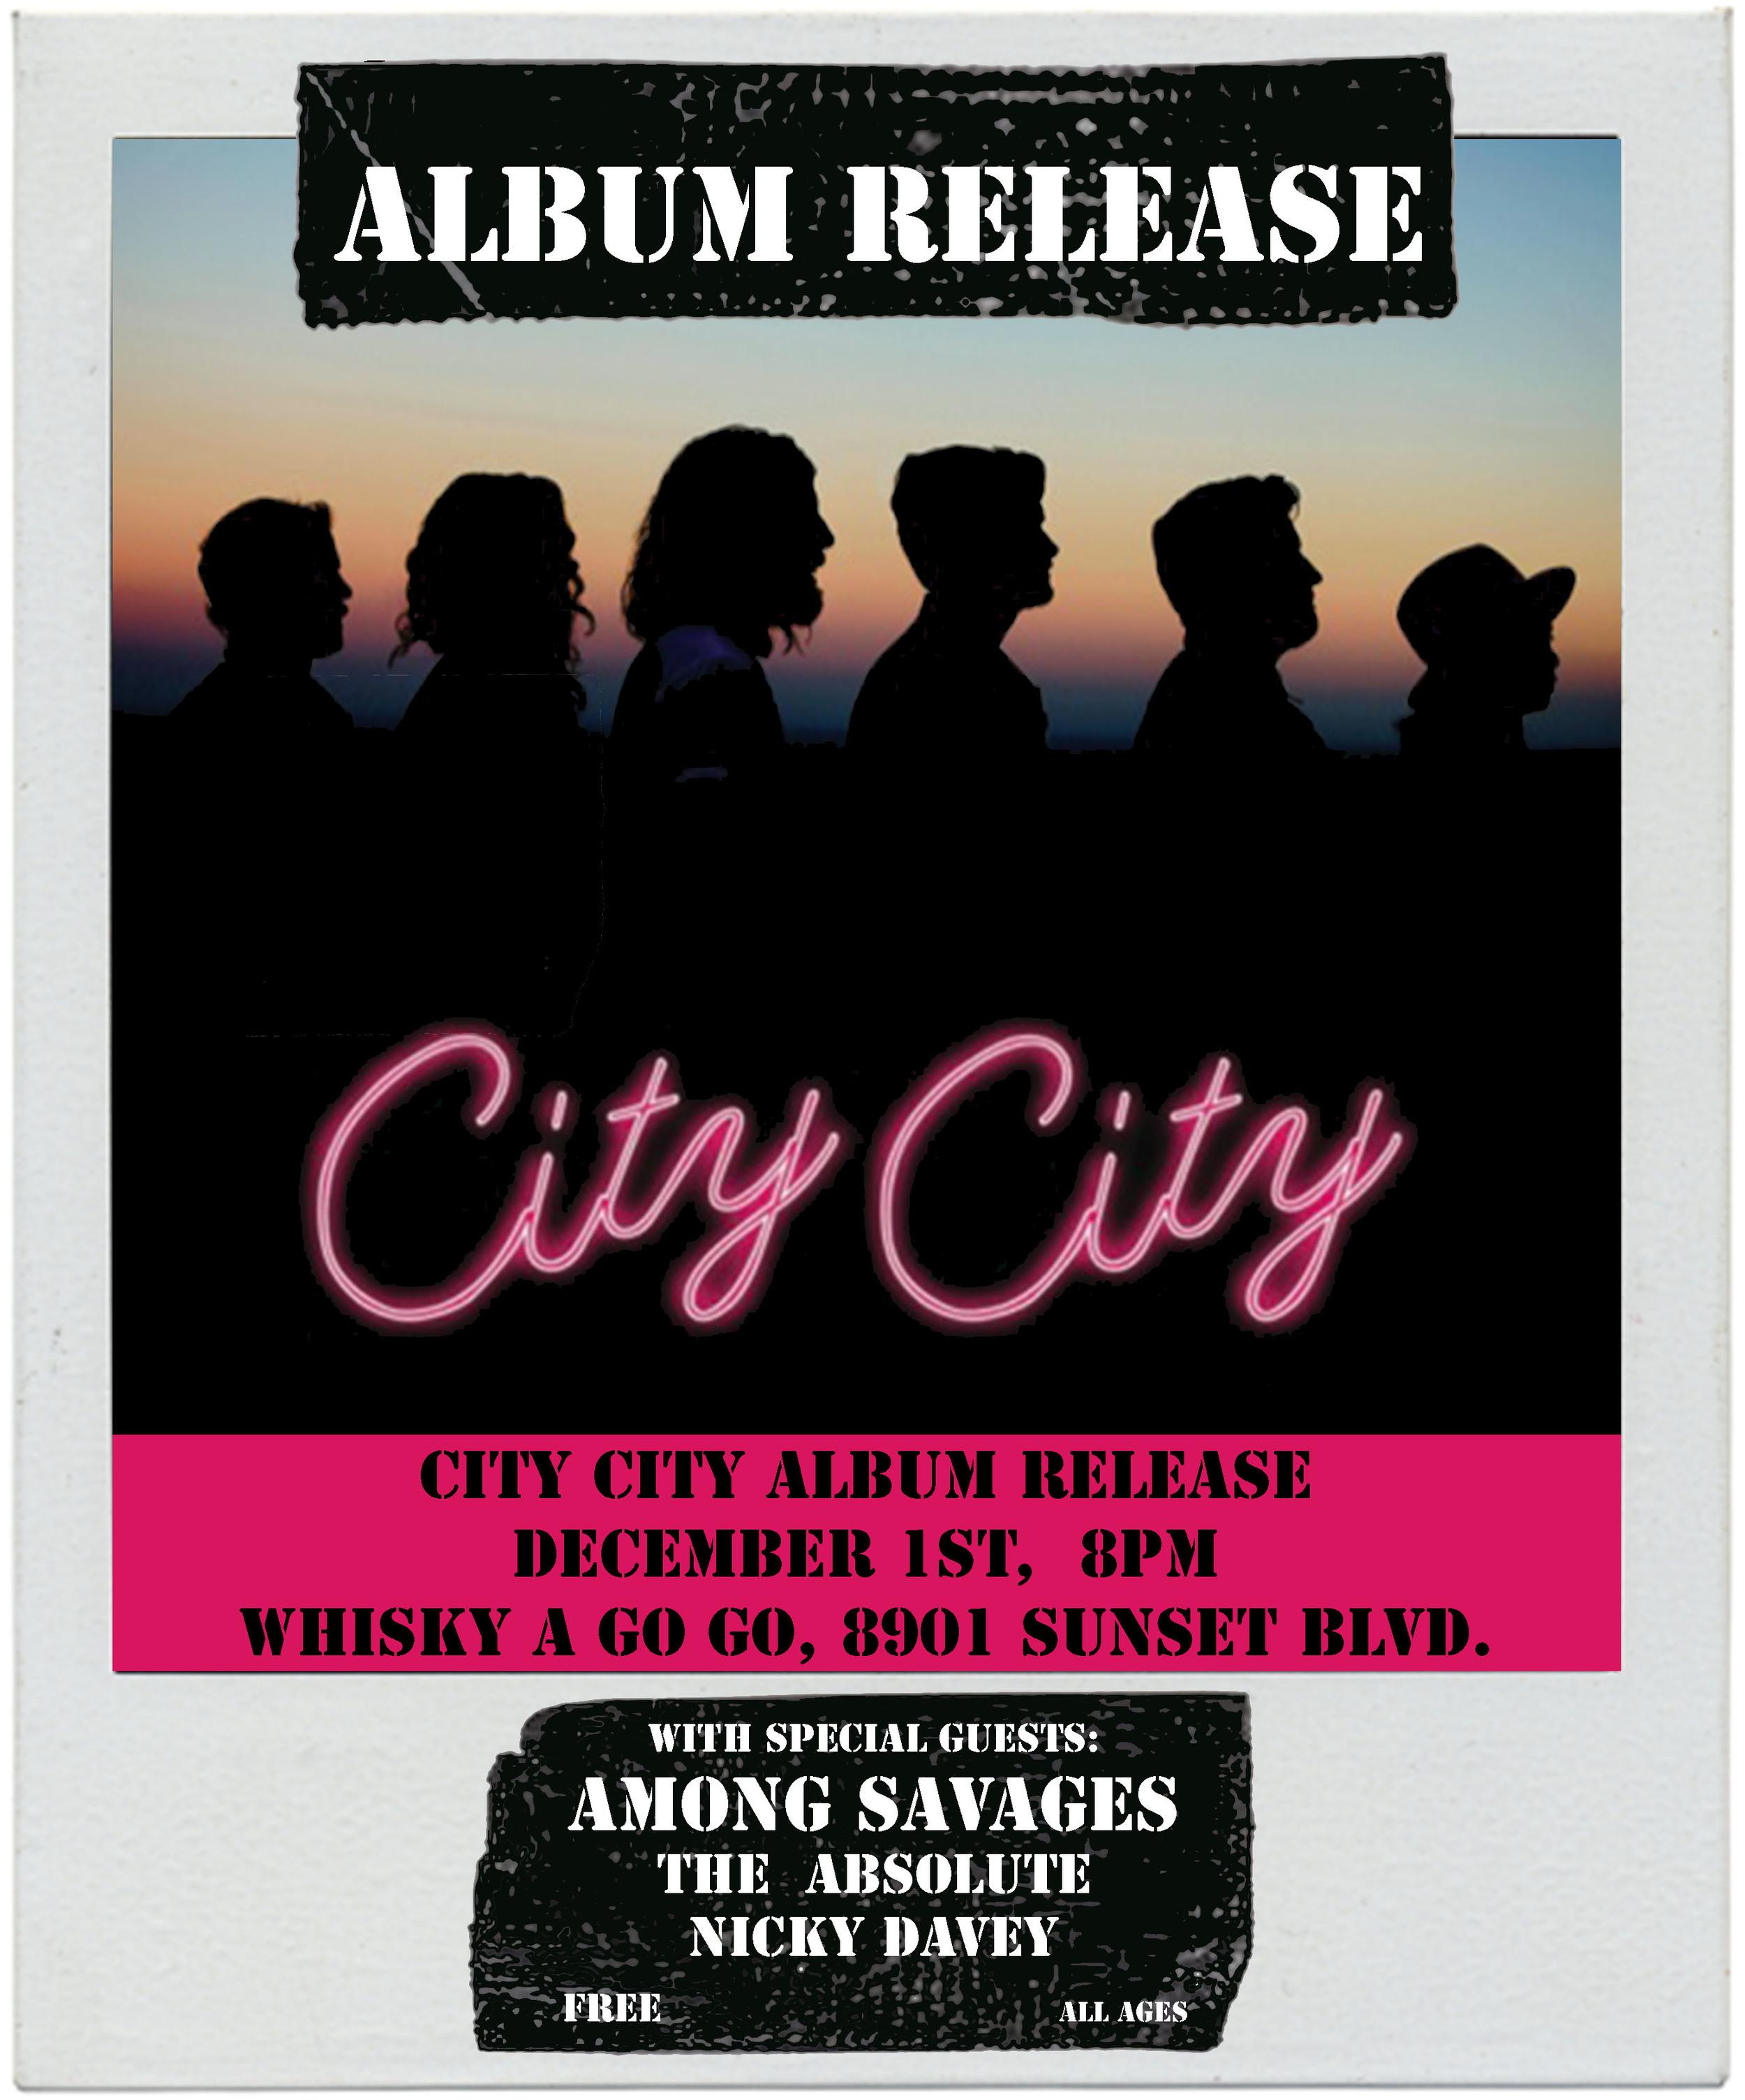 City City Album Release Flyer